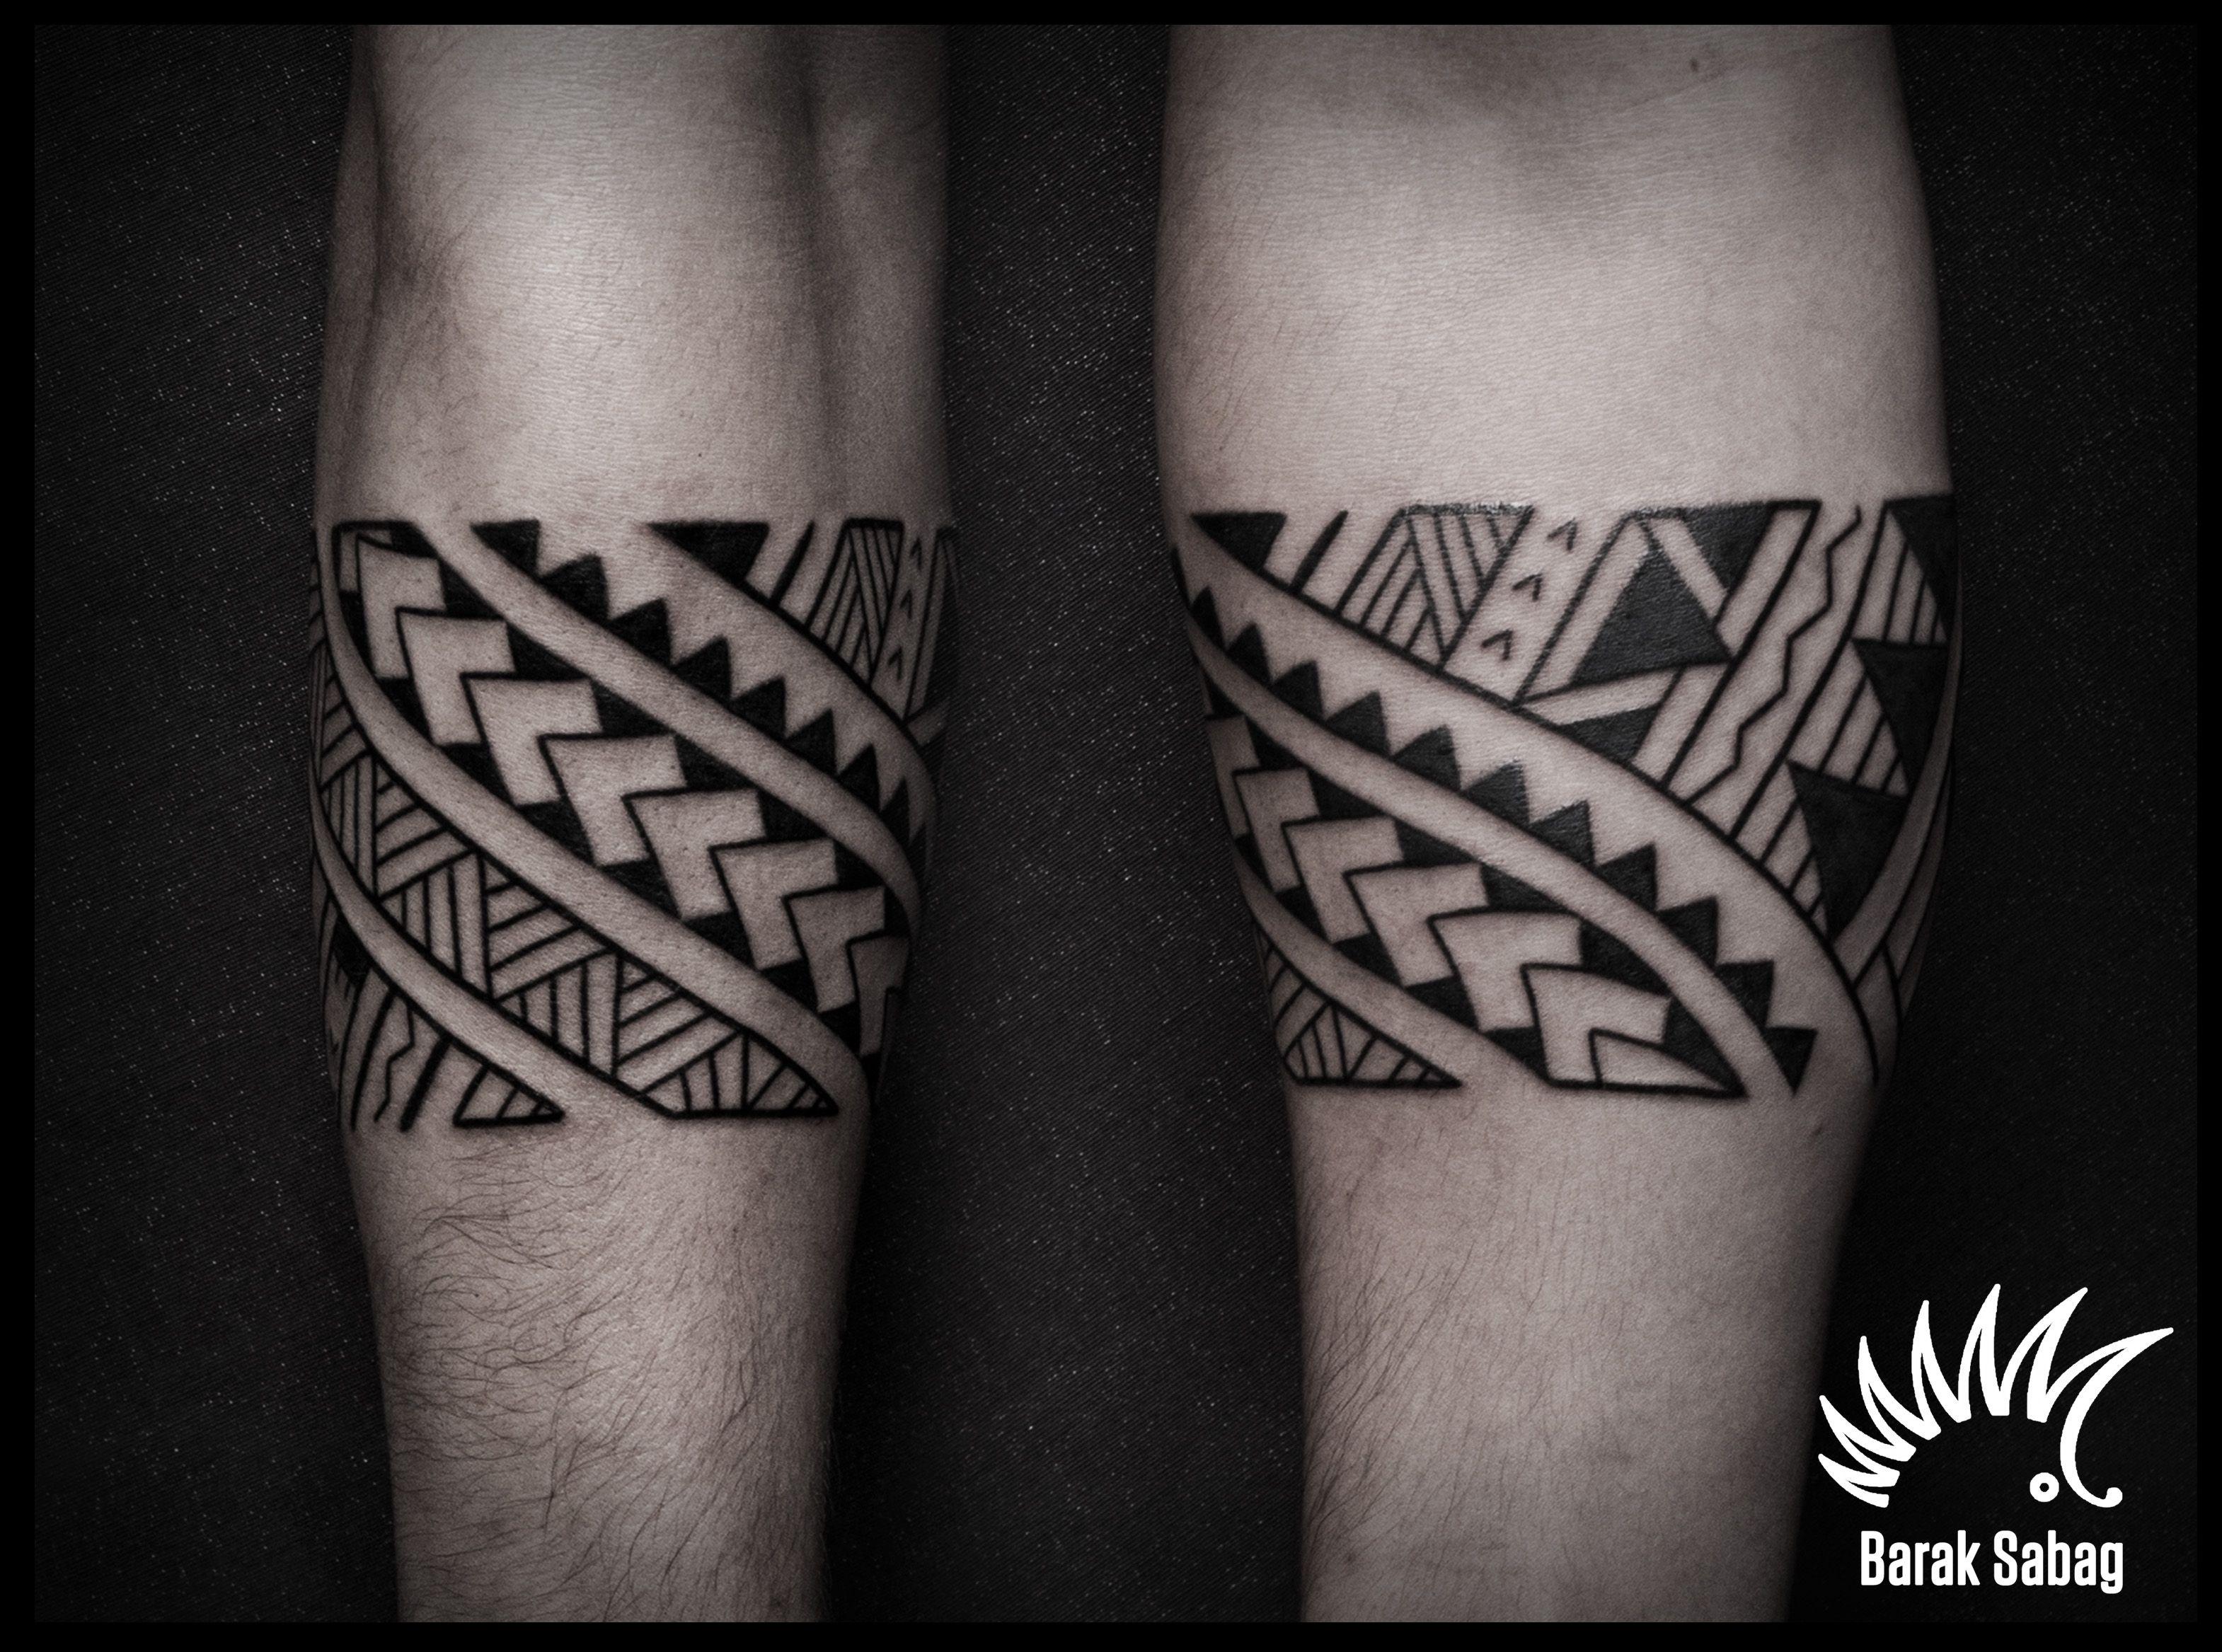 Polynesian Armband Tattoo Barak Sabag Kipoddgmail Tattoos with regard to size 3140 X 2335